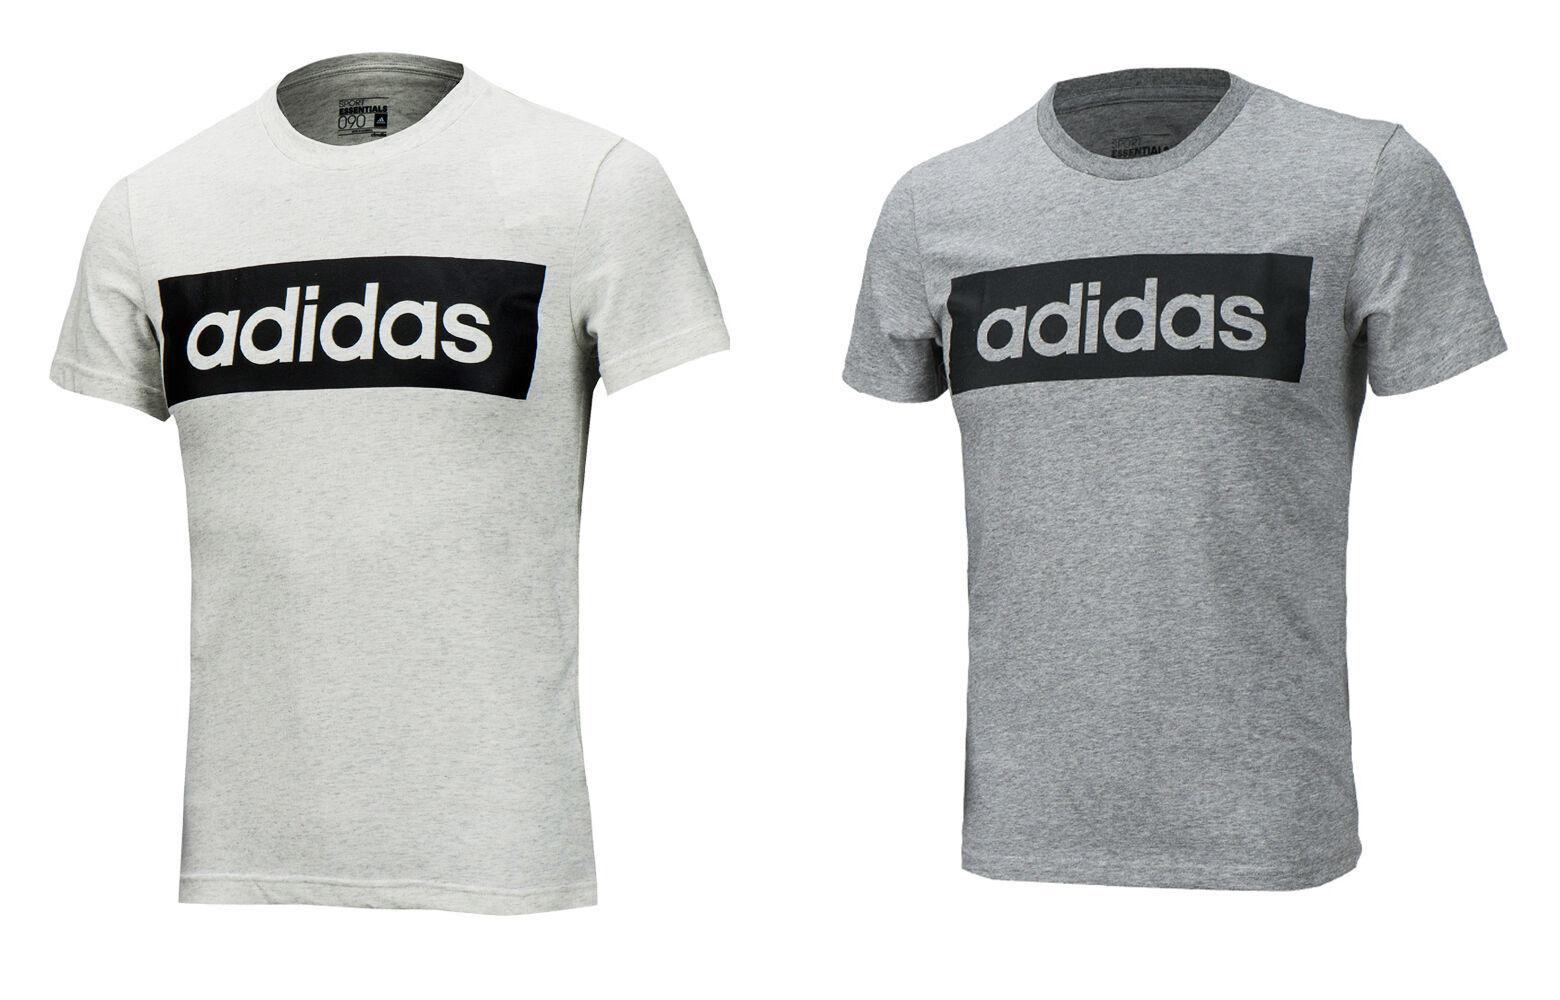 Adidas Linear S S Top AK1809 AY6255 Soccer Football Training Climalite Tee